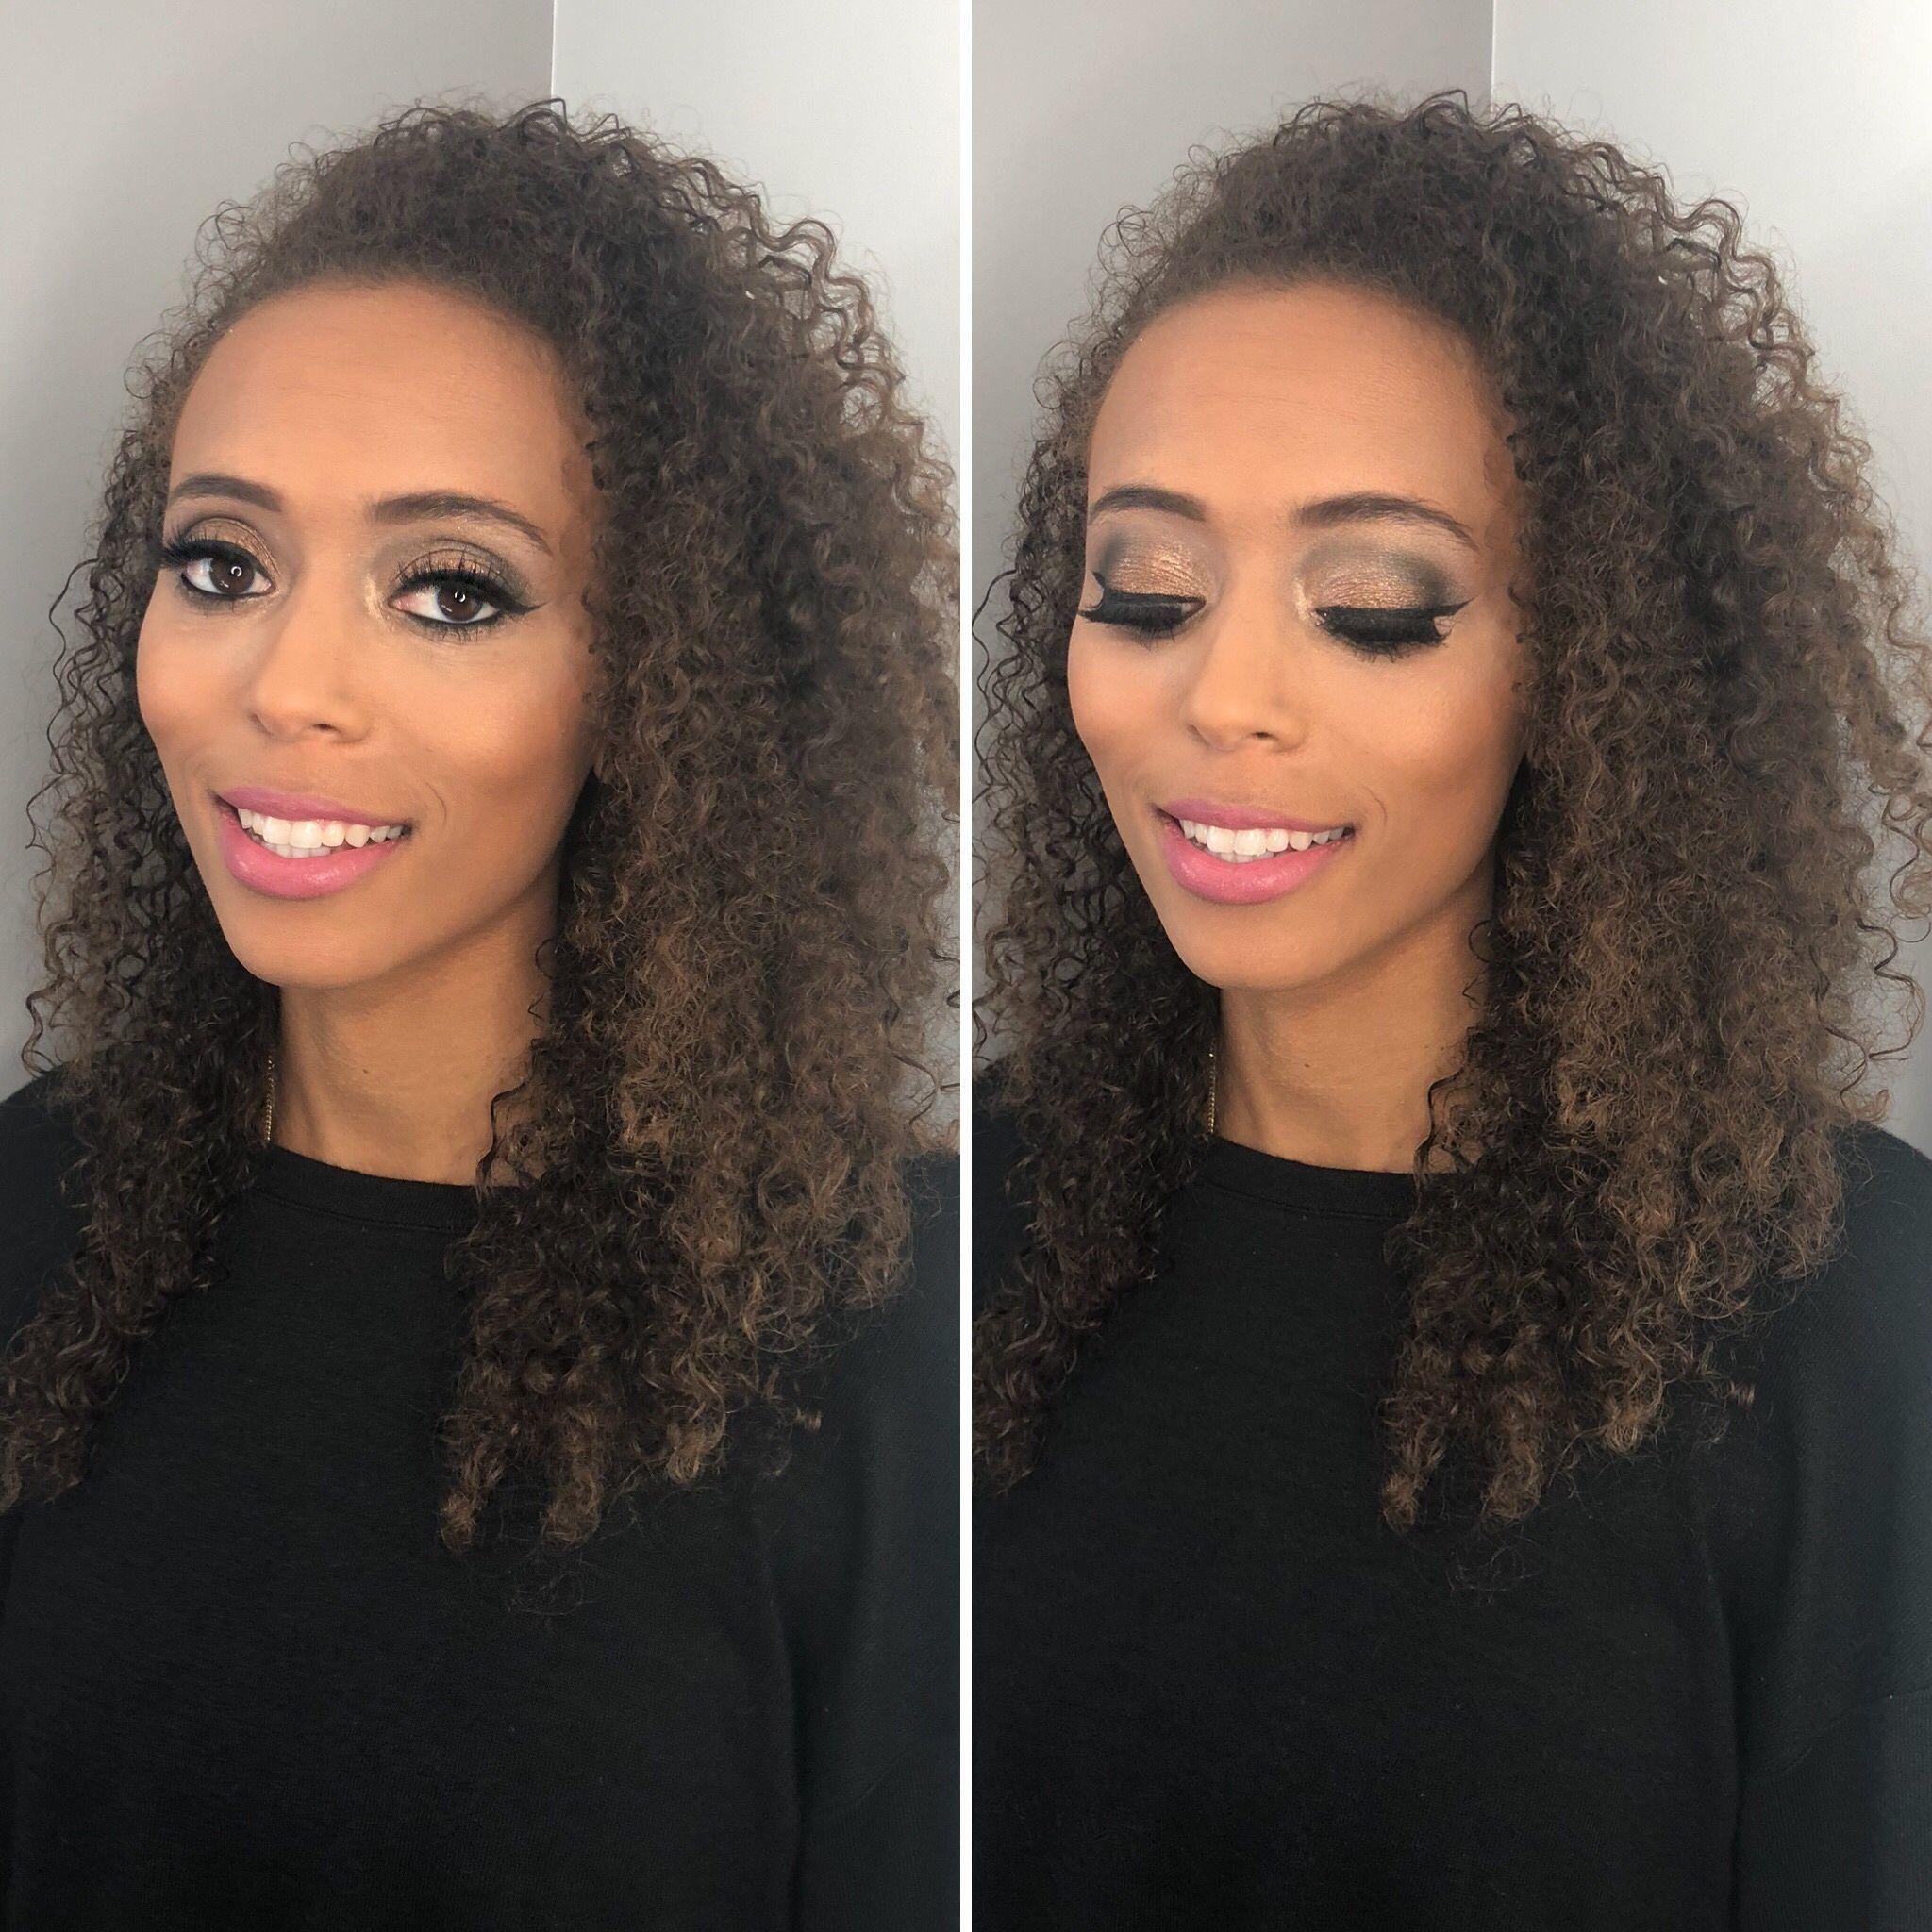 glam makeup edmonton makeup, edmonton wedding, edmonton